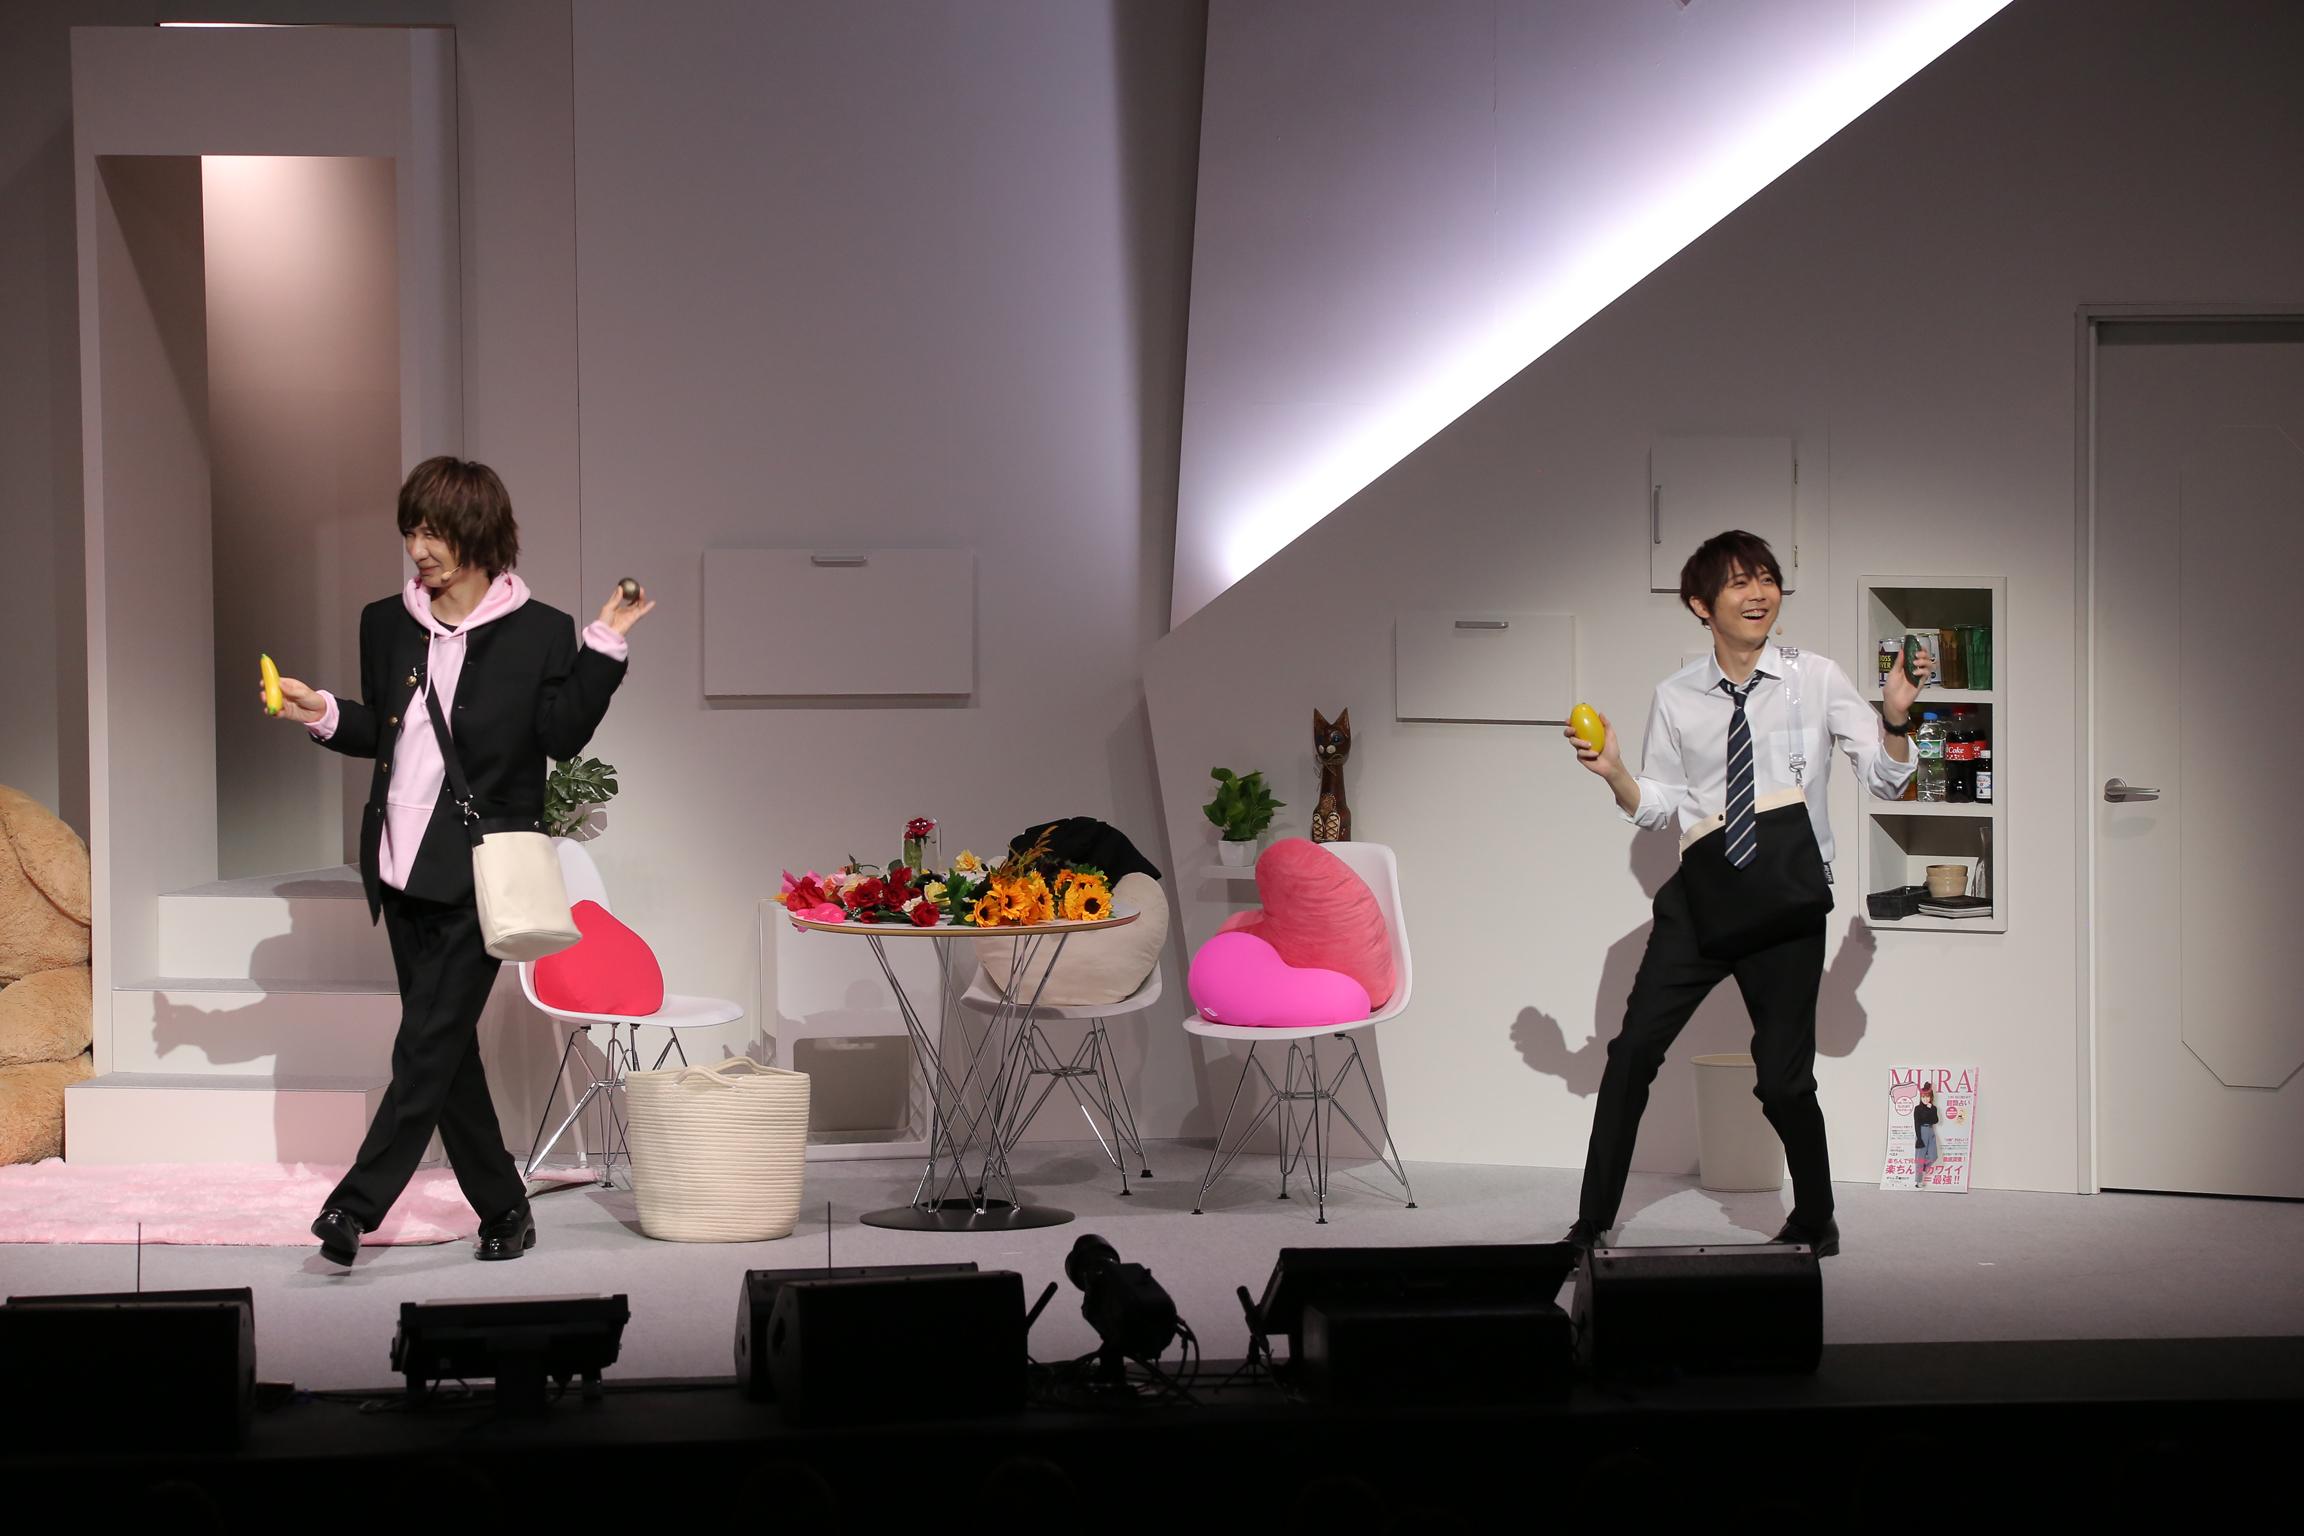 [2019.9.7昼公演]梶裕貴×前野智昭 (C) AD-LIVE Project